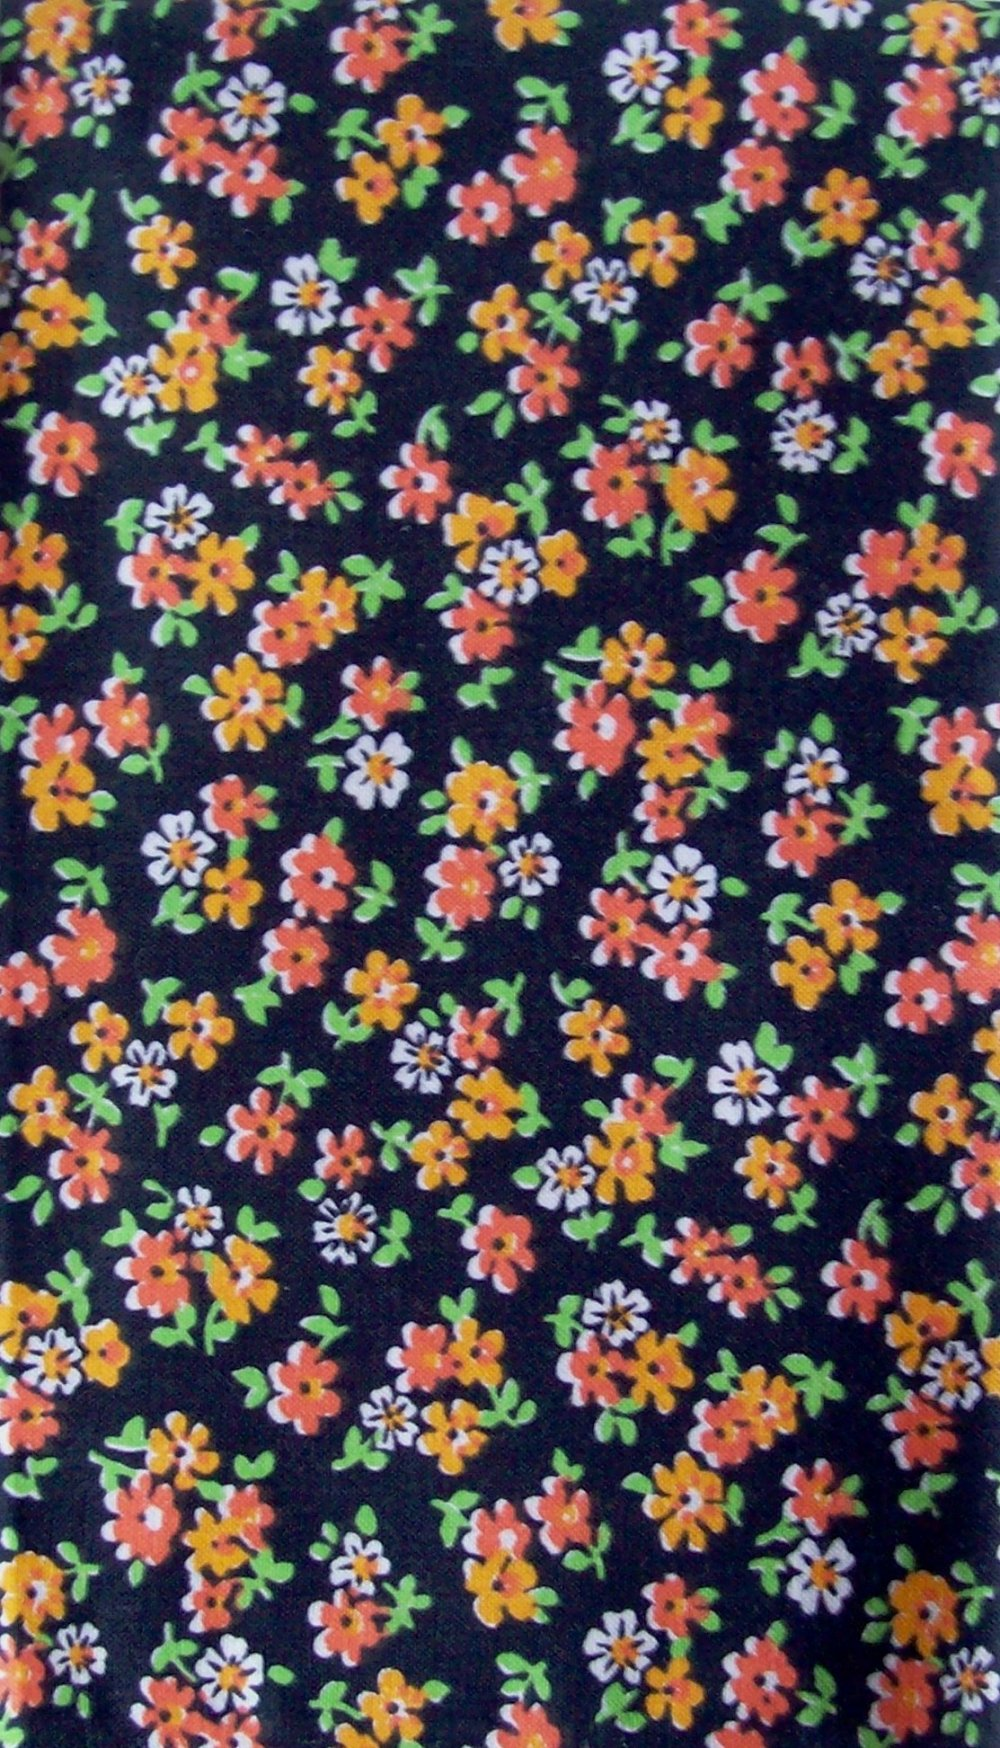 Tissu Petites Fleurs noir/vert/orange 52x46cm